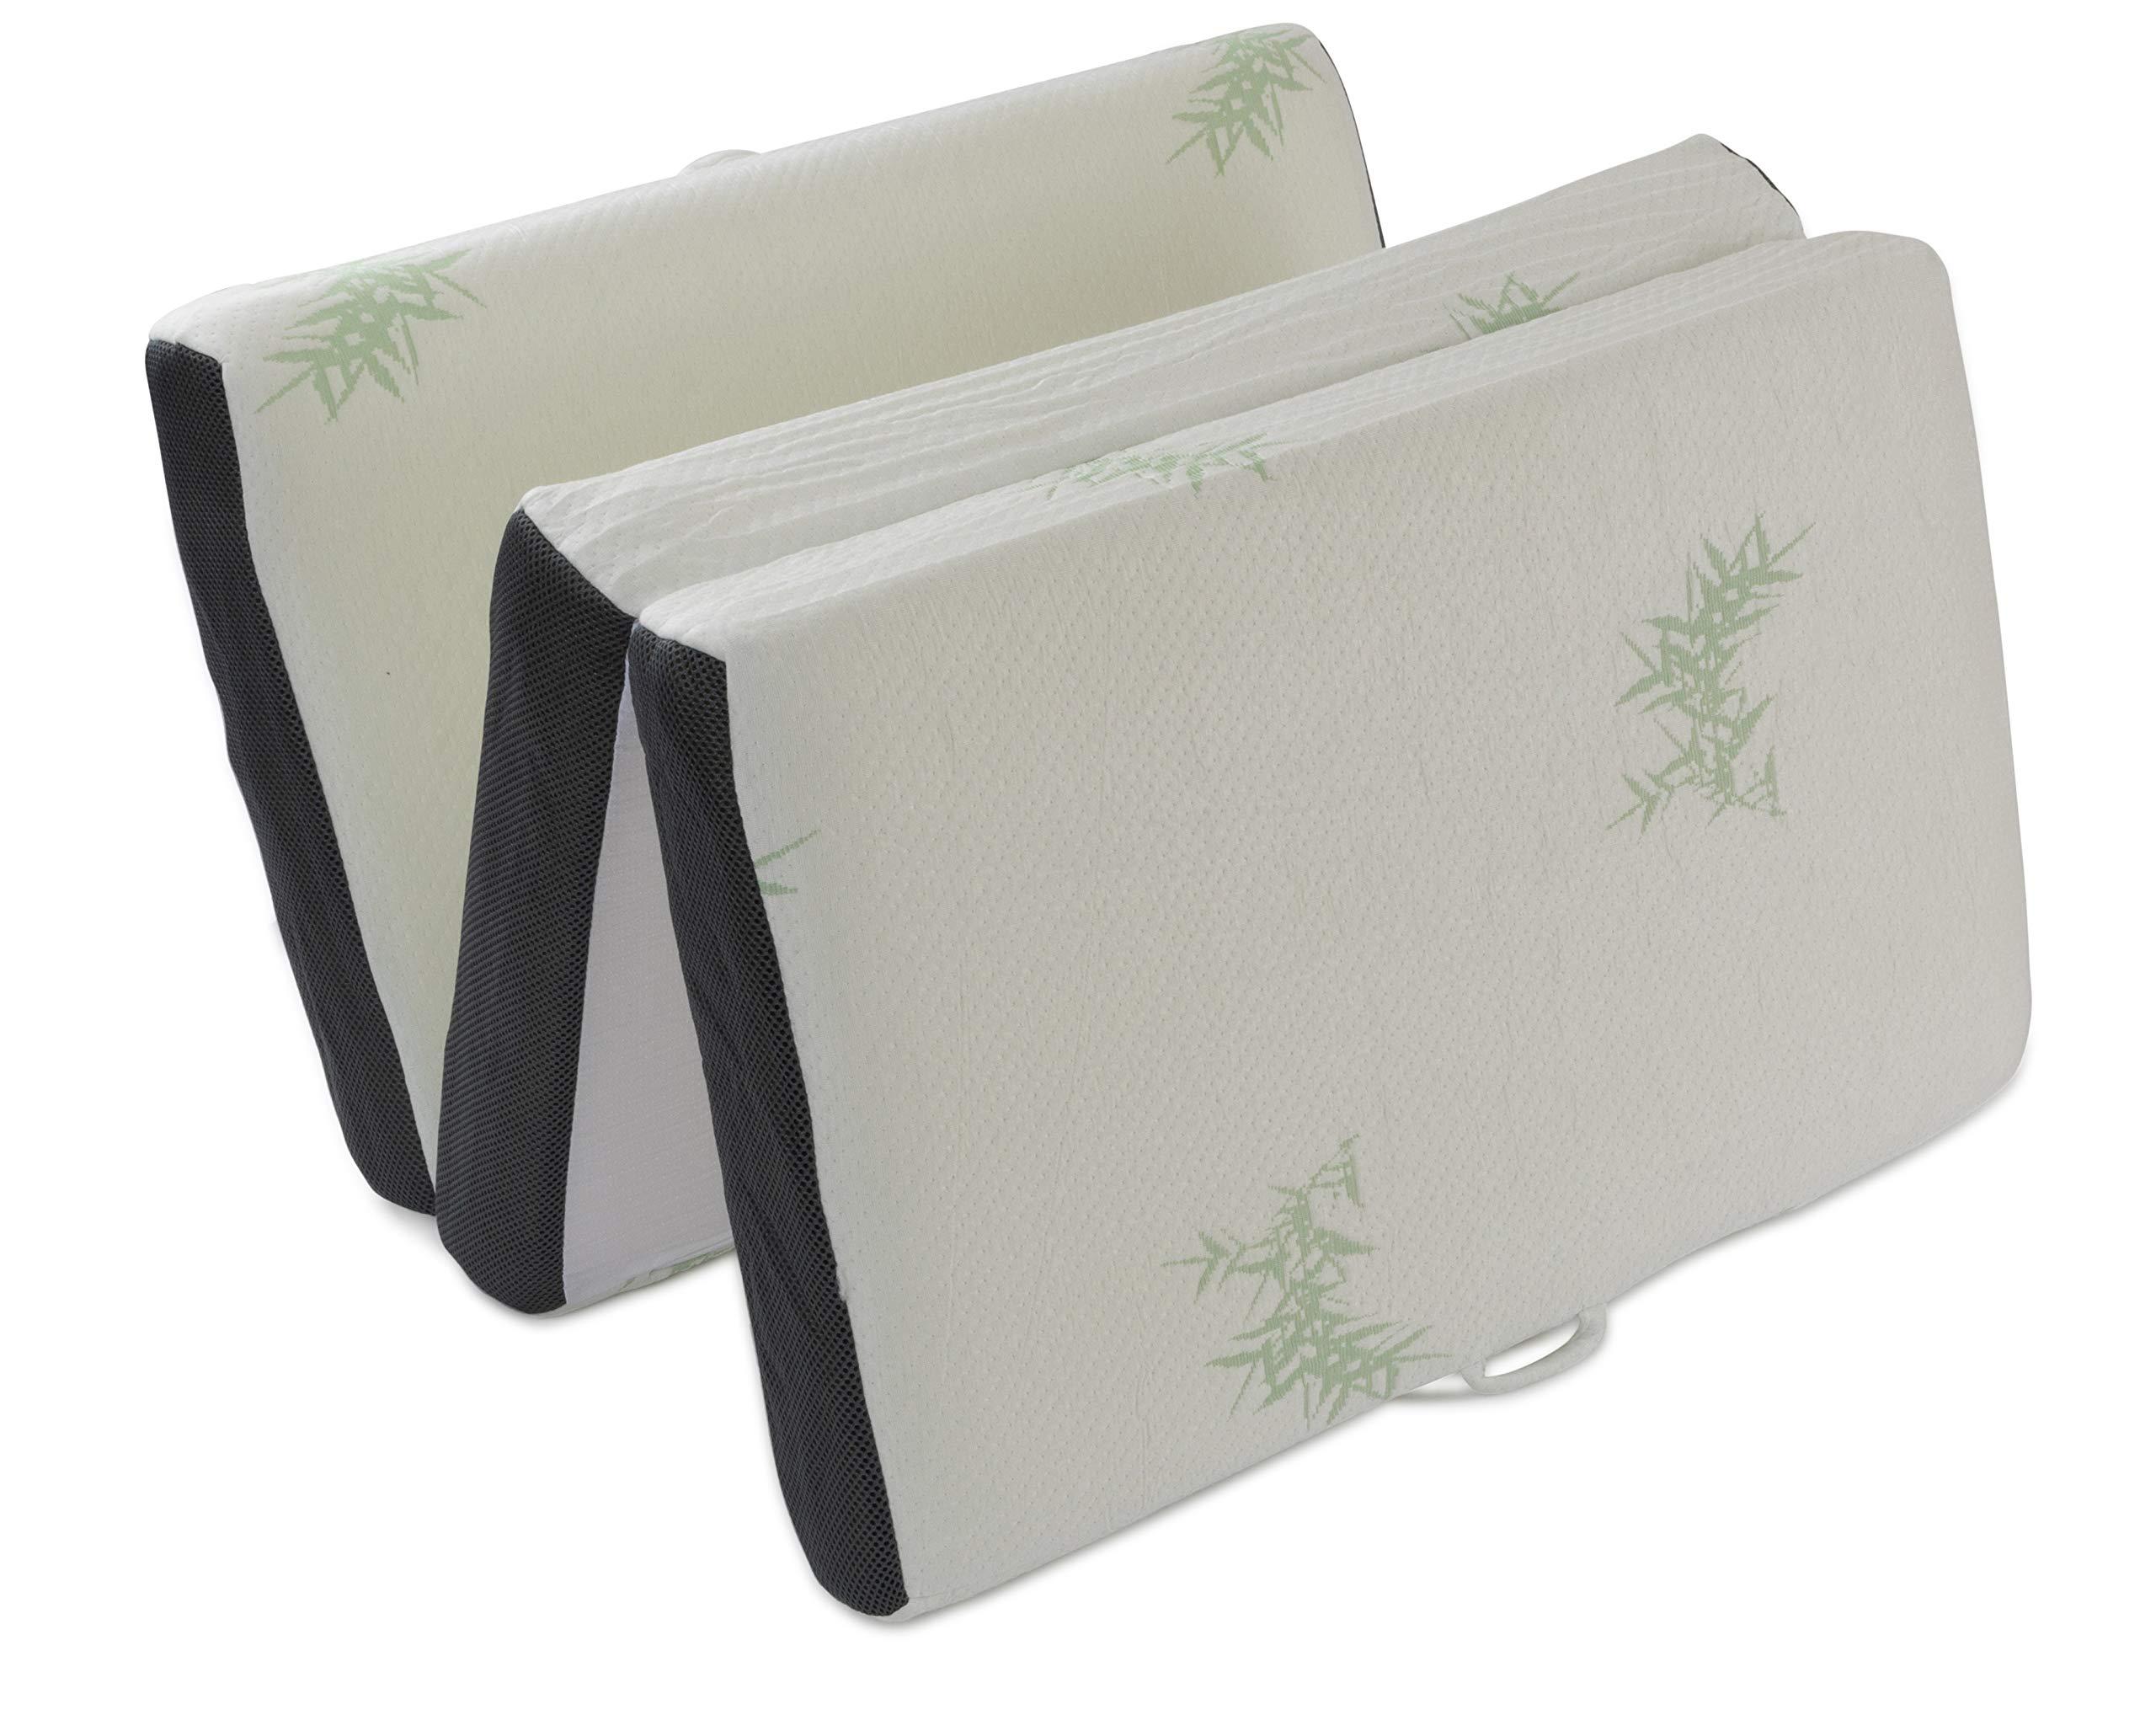 LifeSmart USA Memory Foam Travel Mattress Foldable Ultra Thick Non-Slip Bottom, Including Carry Strap (Toddler) by LifeSmart